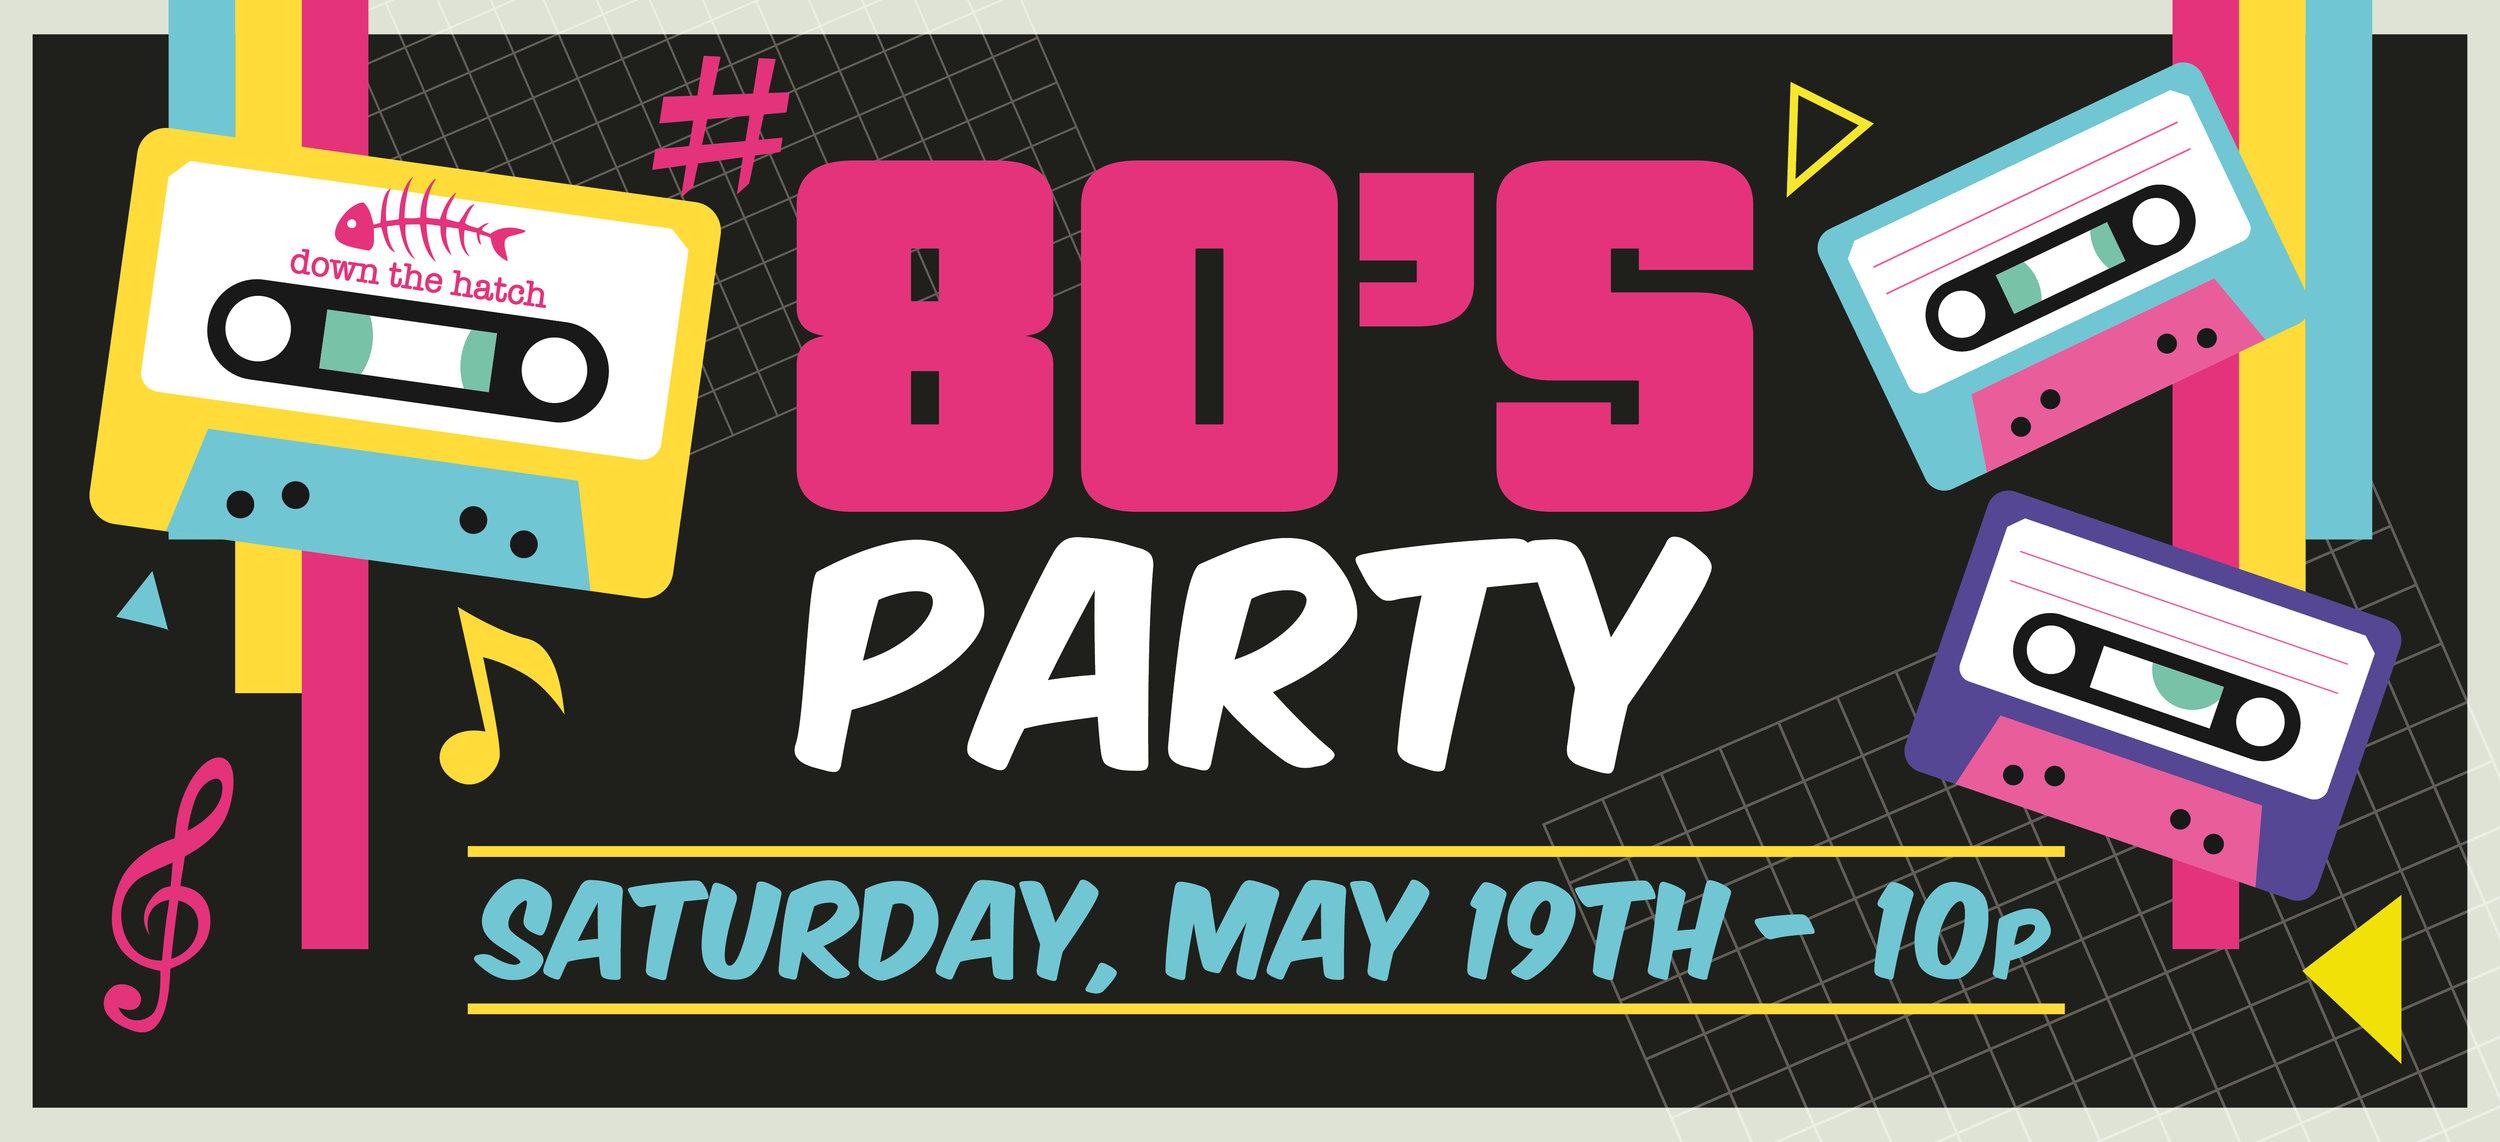 80s PARTY FACEBOOK.jpg